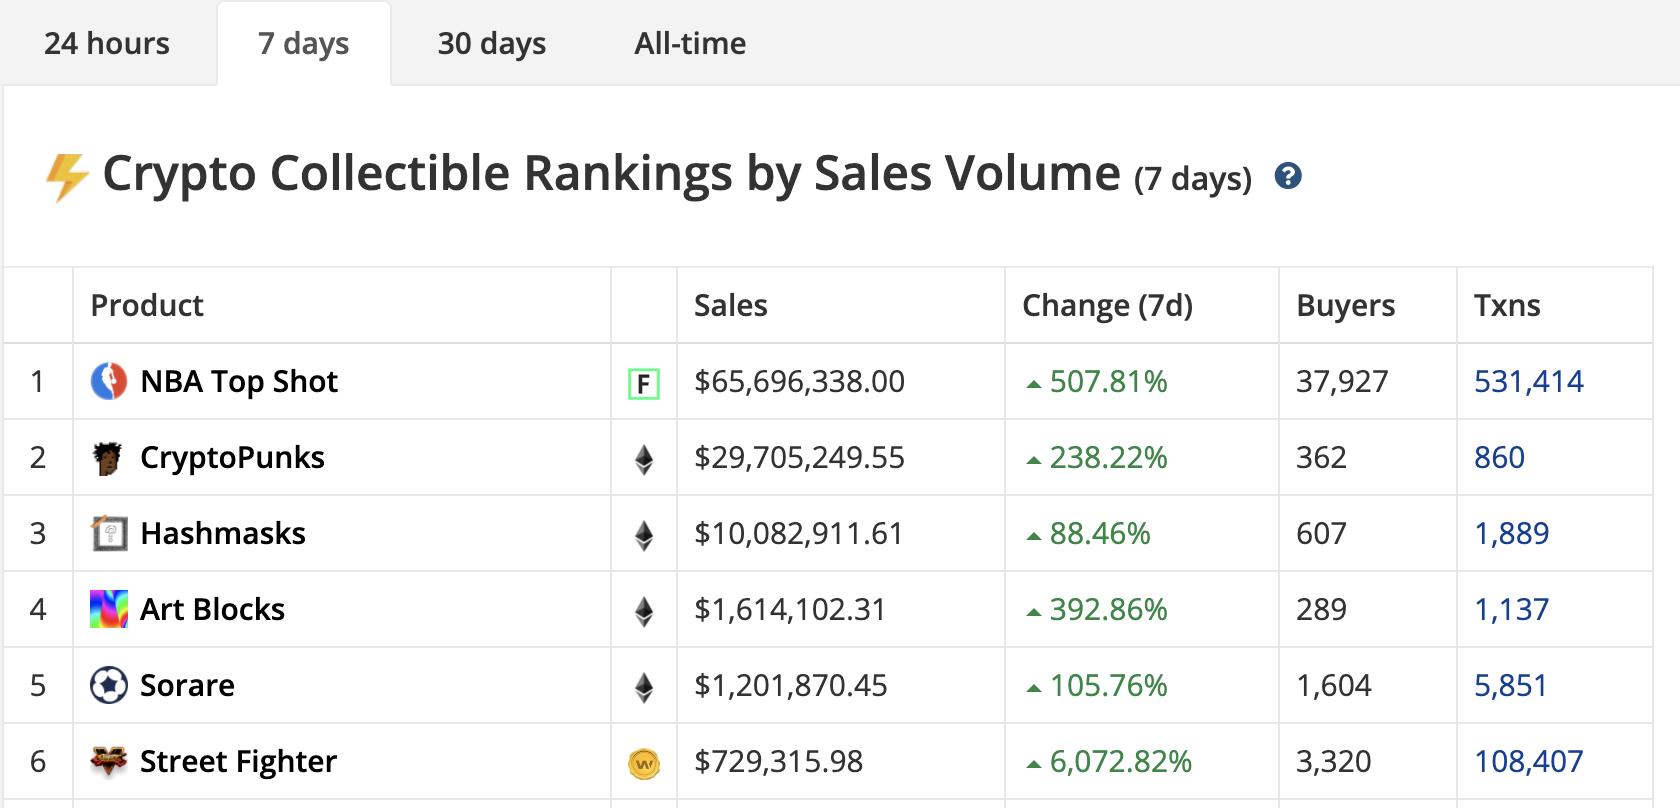 CryptoSlam 7 days sales by volume